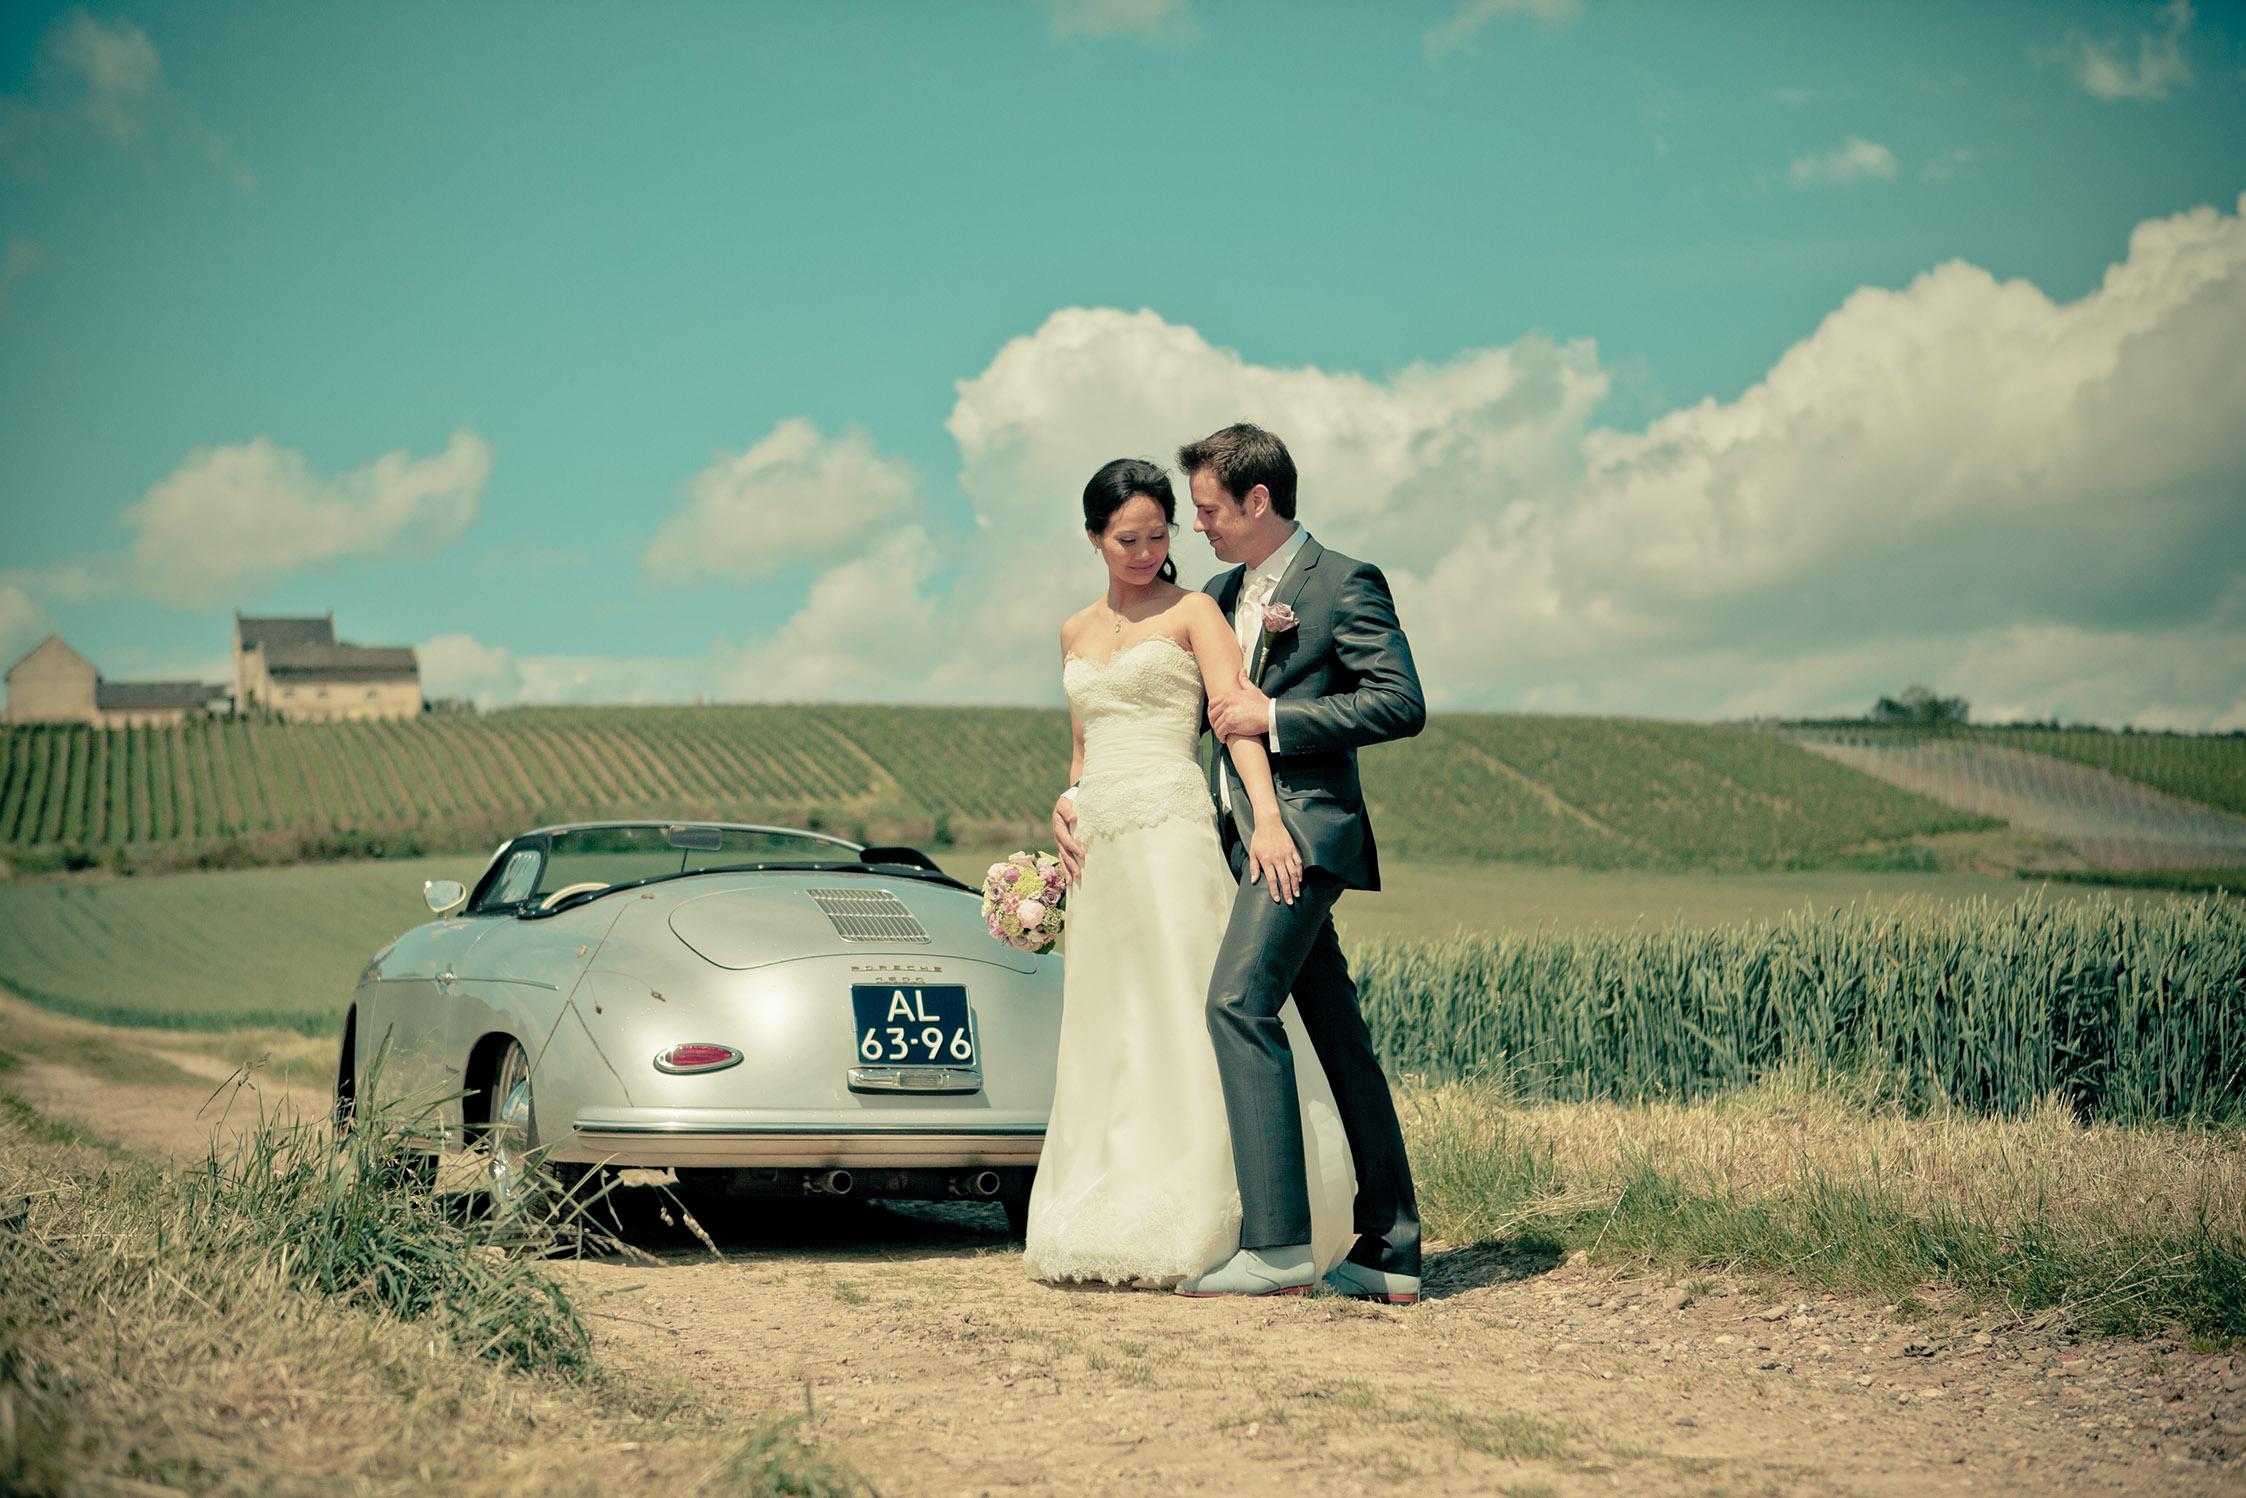 Bas-Driessen-Fotografie-Bruidsreportage-Melanie-en-Patrick-1-slider